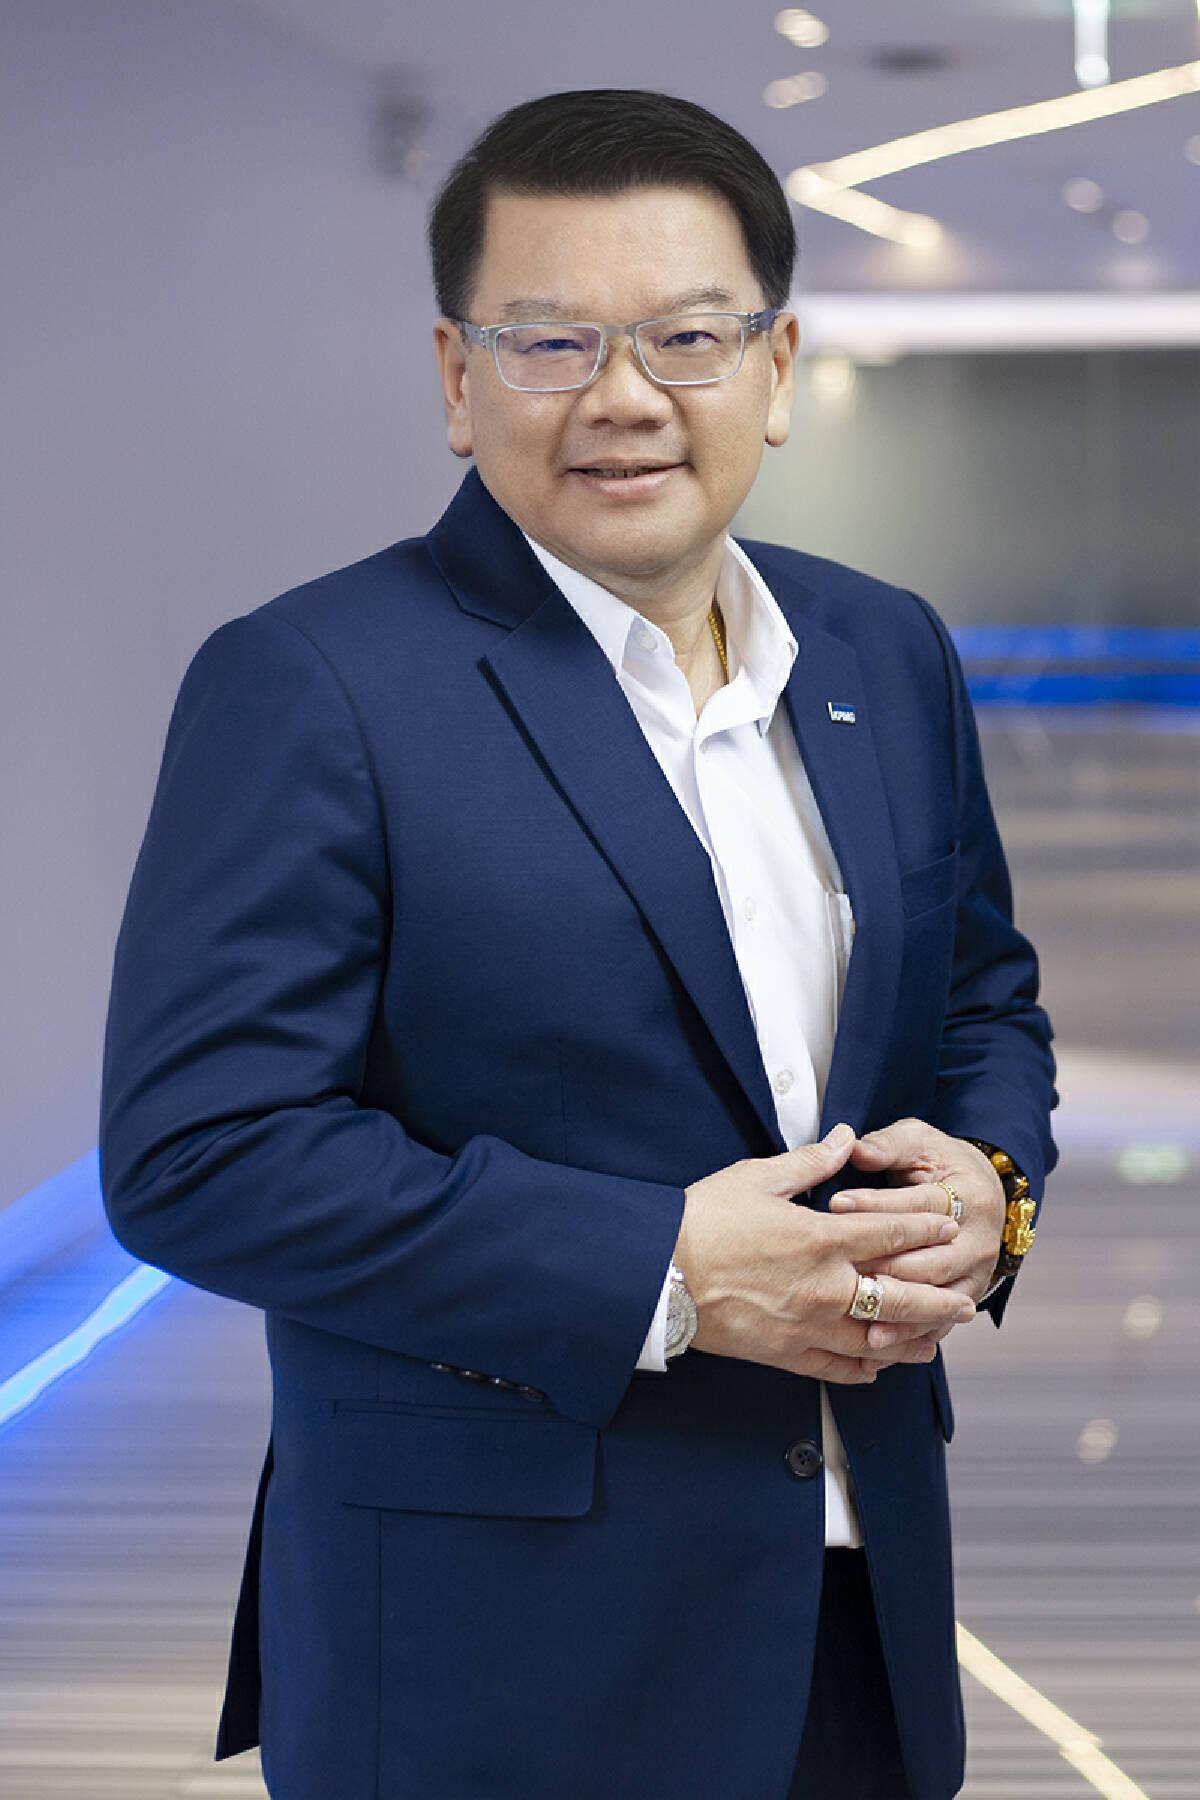 Charoen Phosamritlert, CEO, KPMG in Thailand